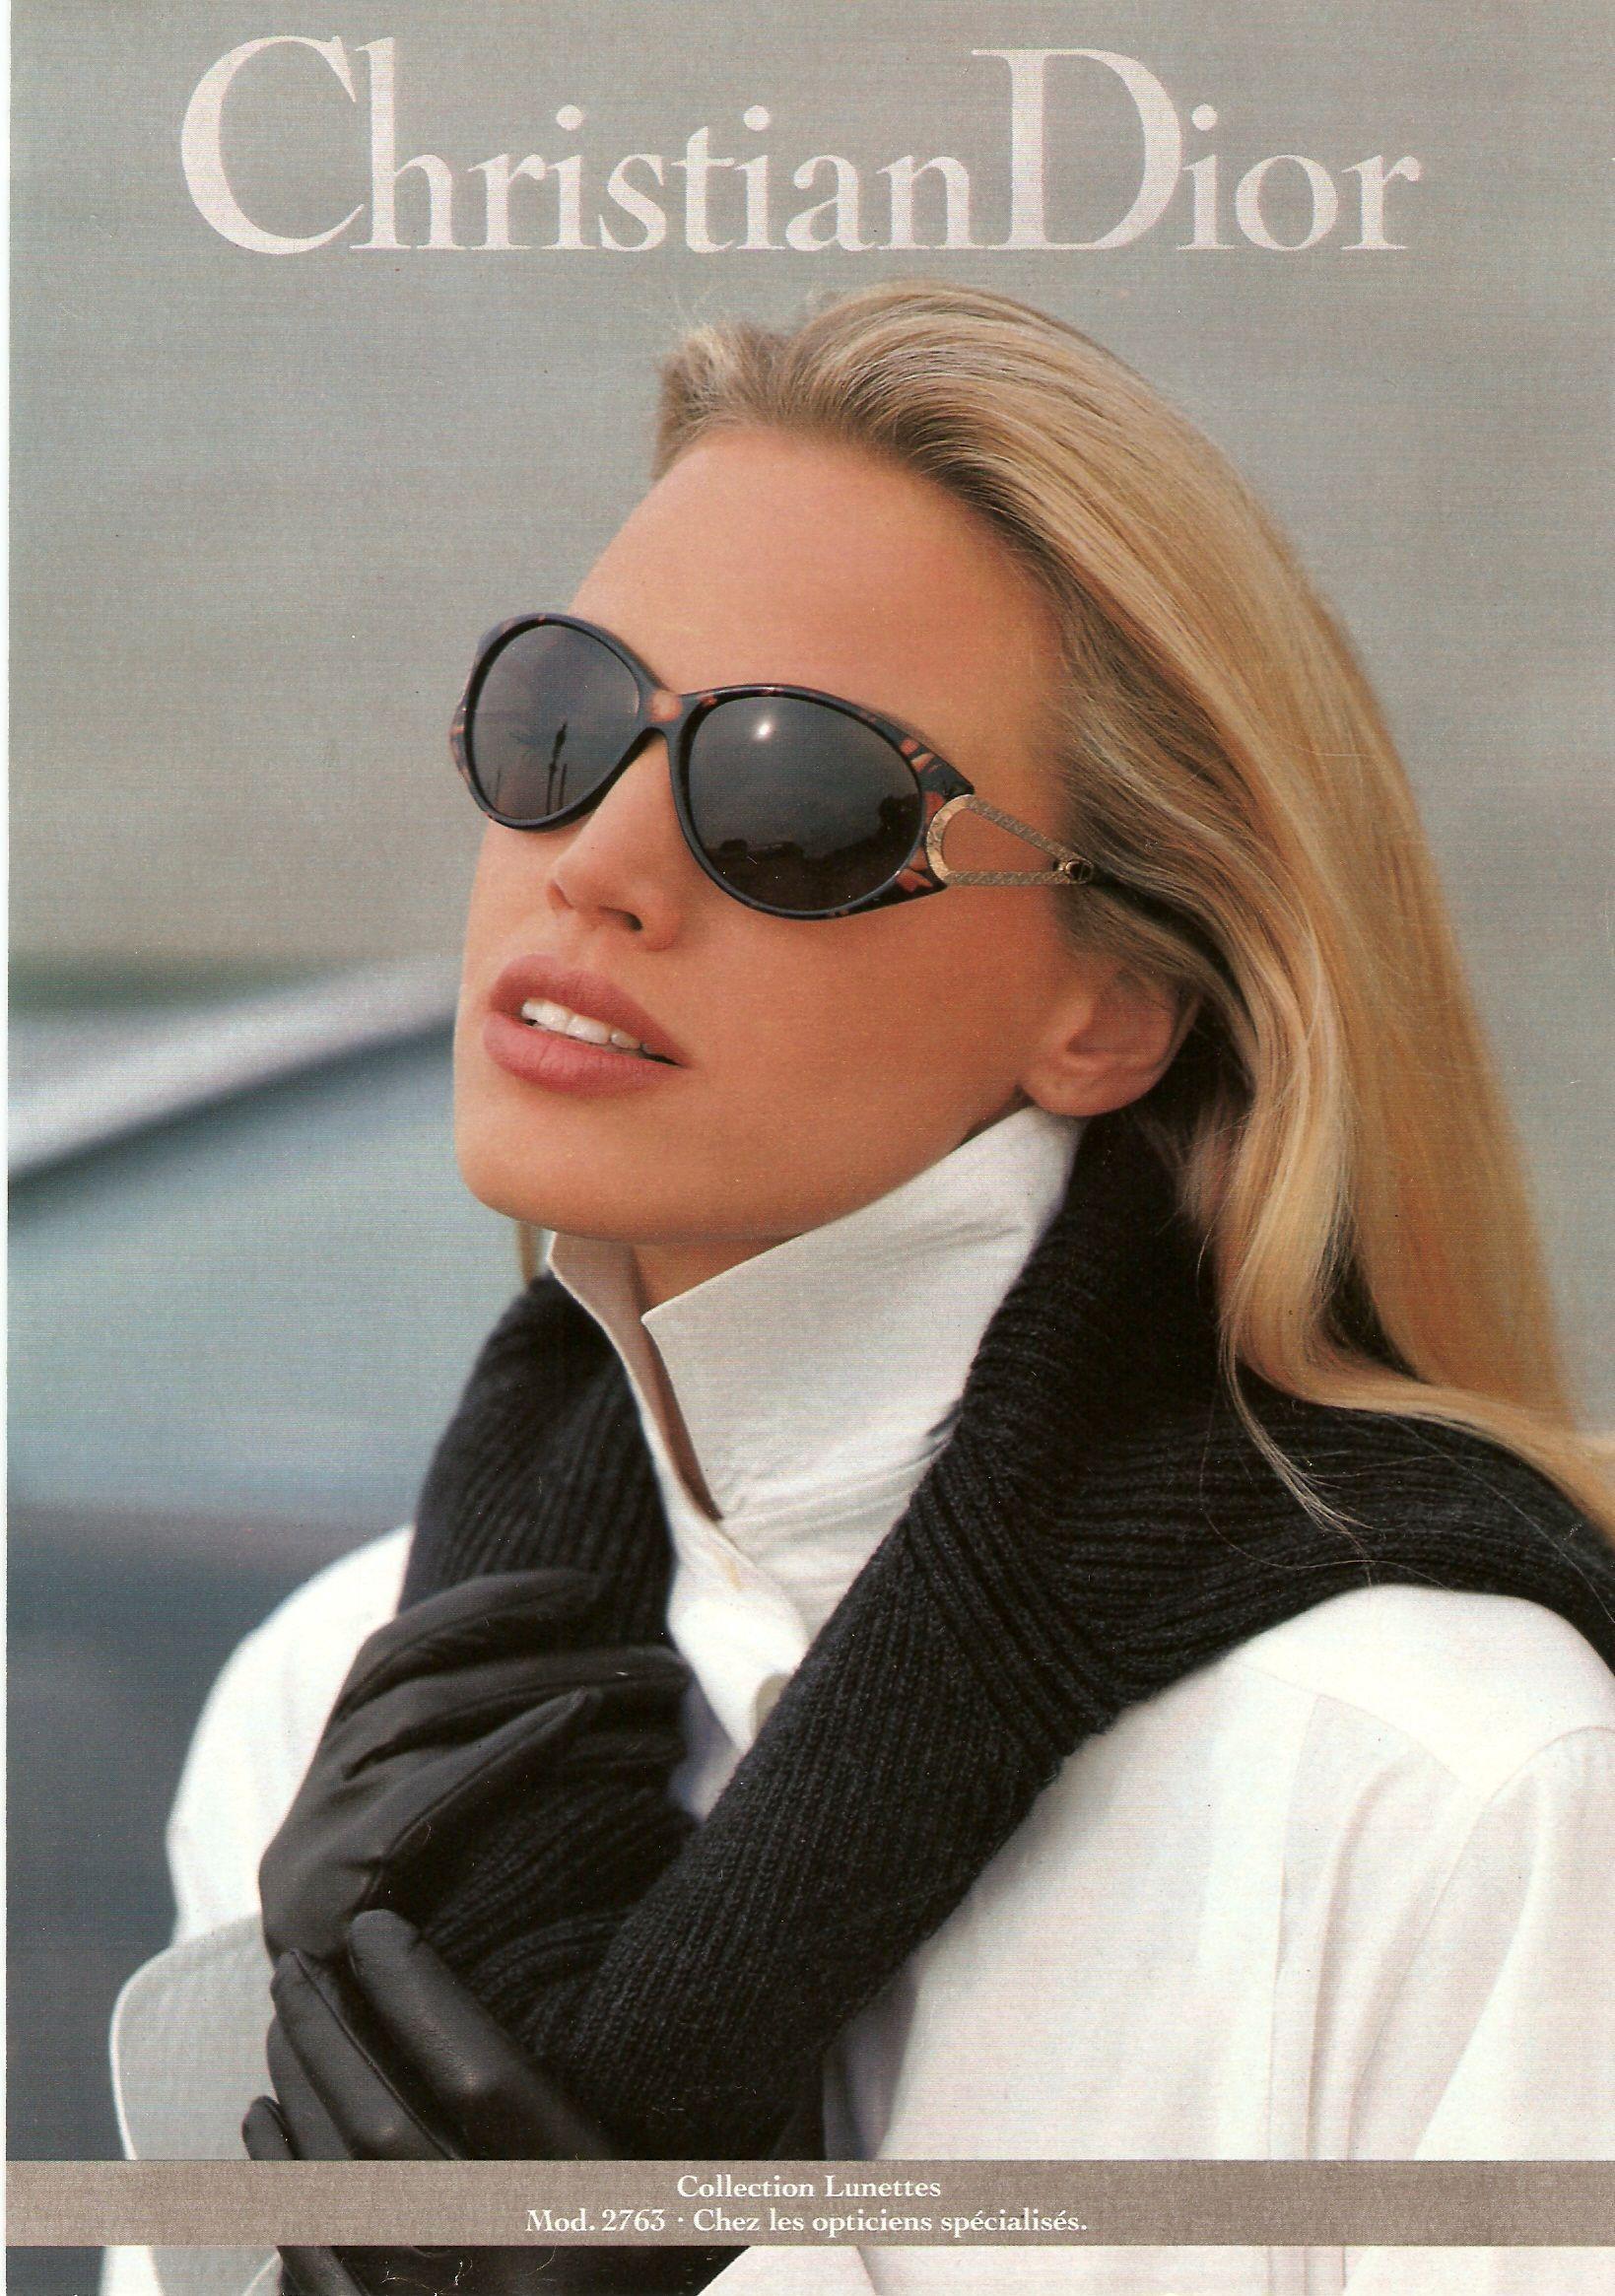 aae8d39448e2 Joanna Rhodes 90s Makeup, Gianfranco Ferre, John Galliano, Alook, Mirrored  Sunglasses,